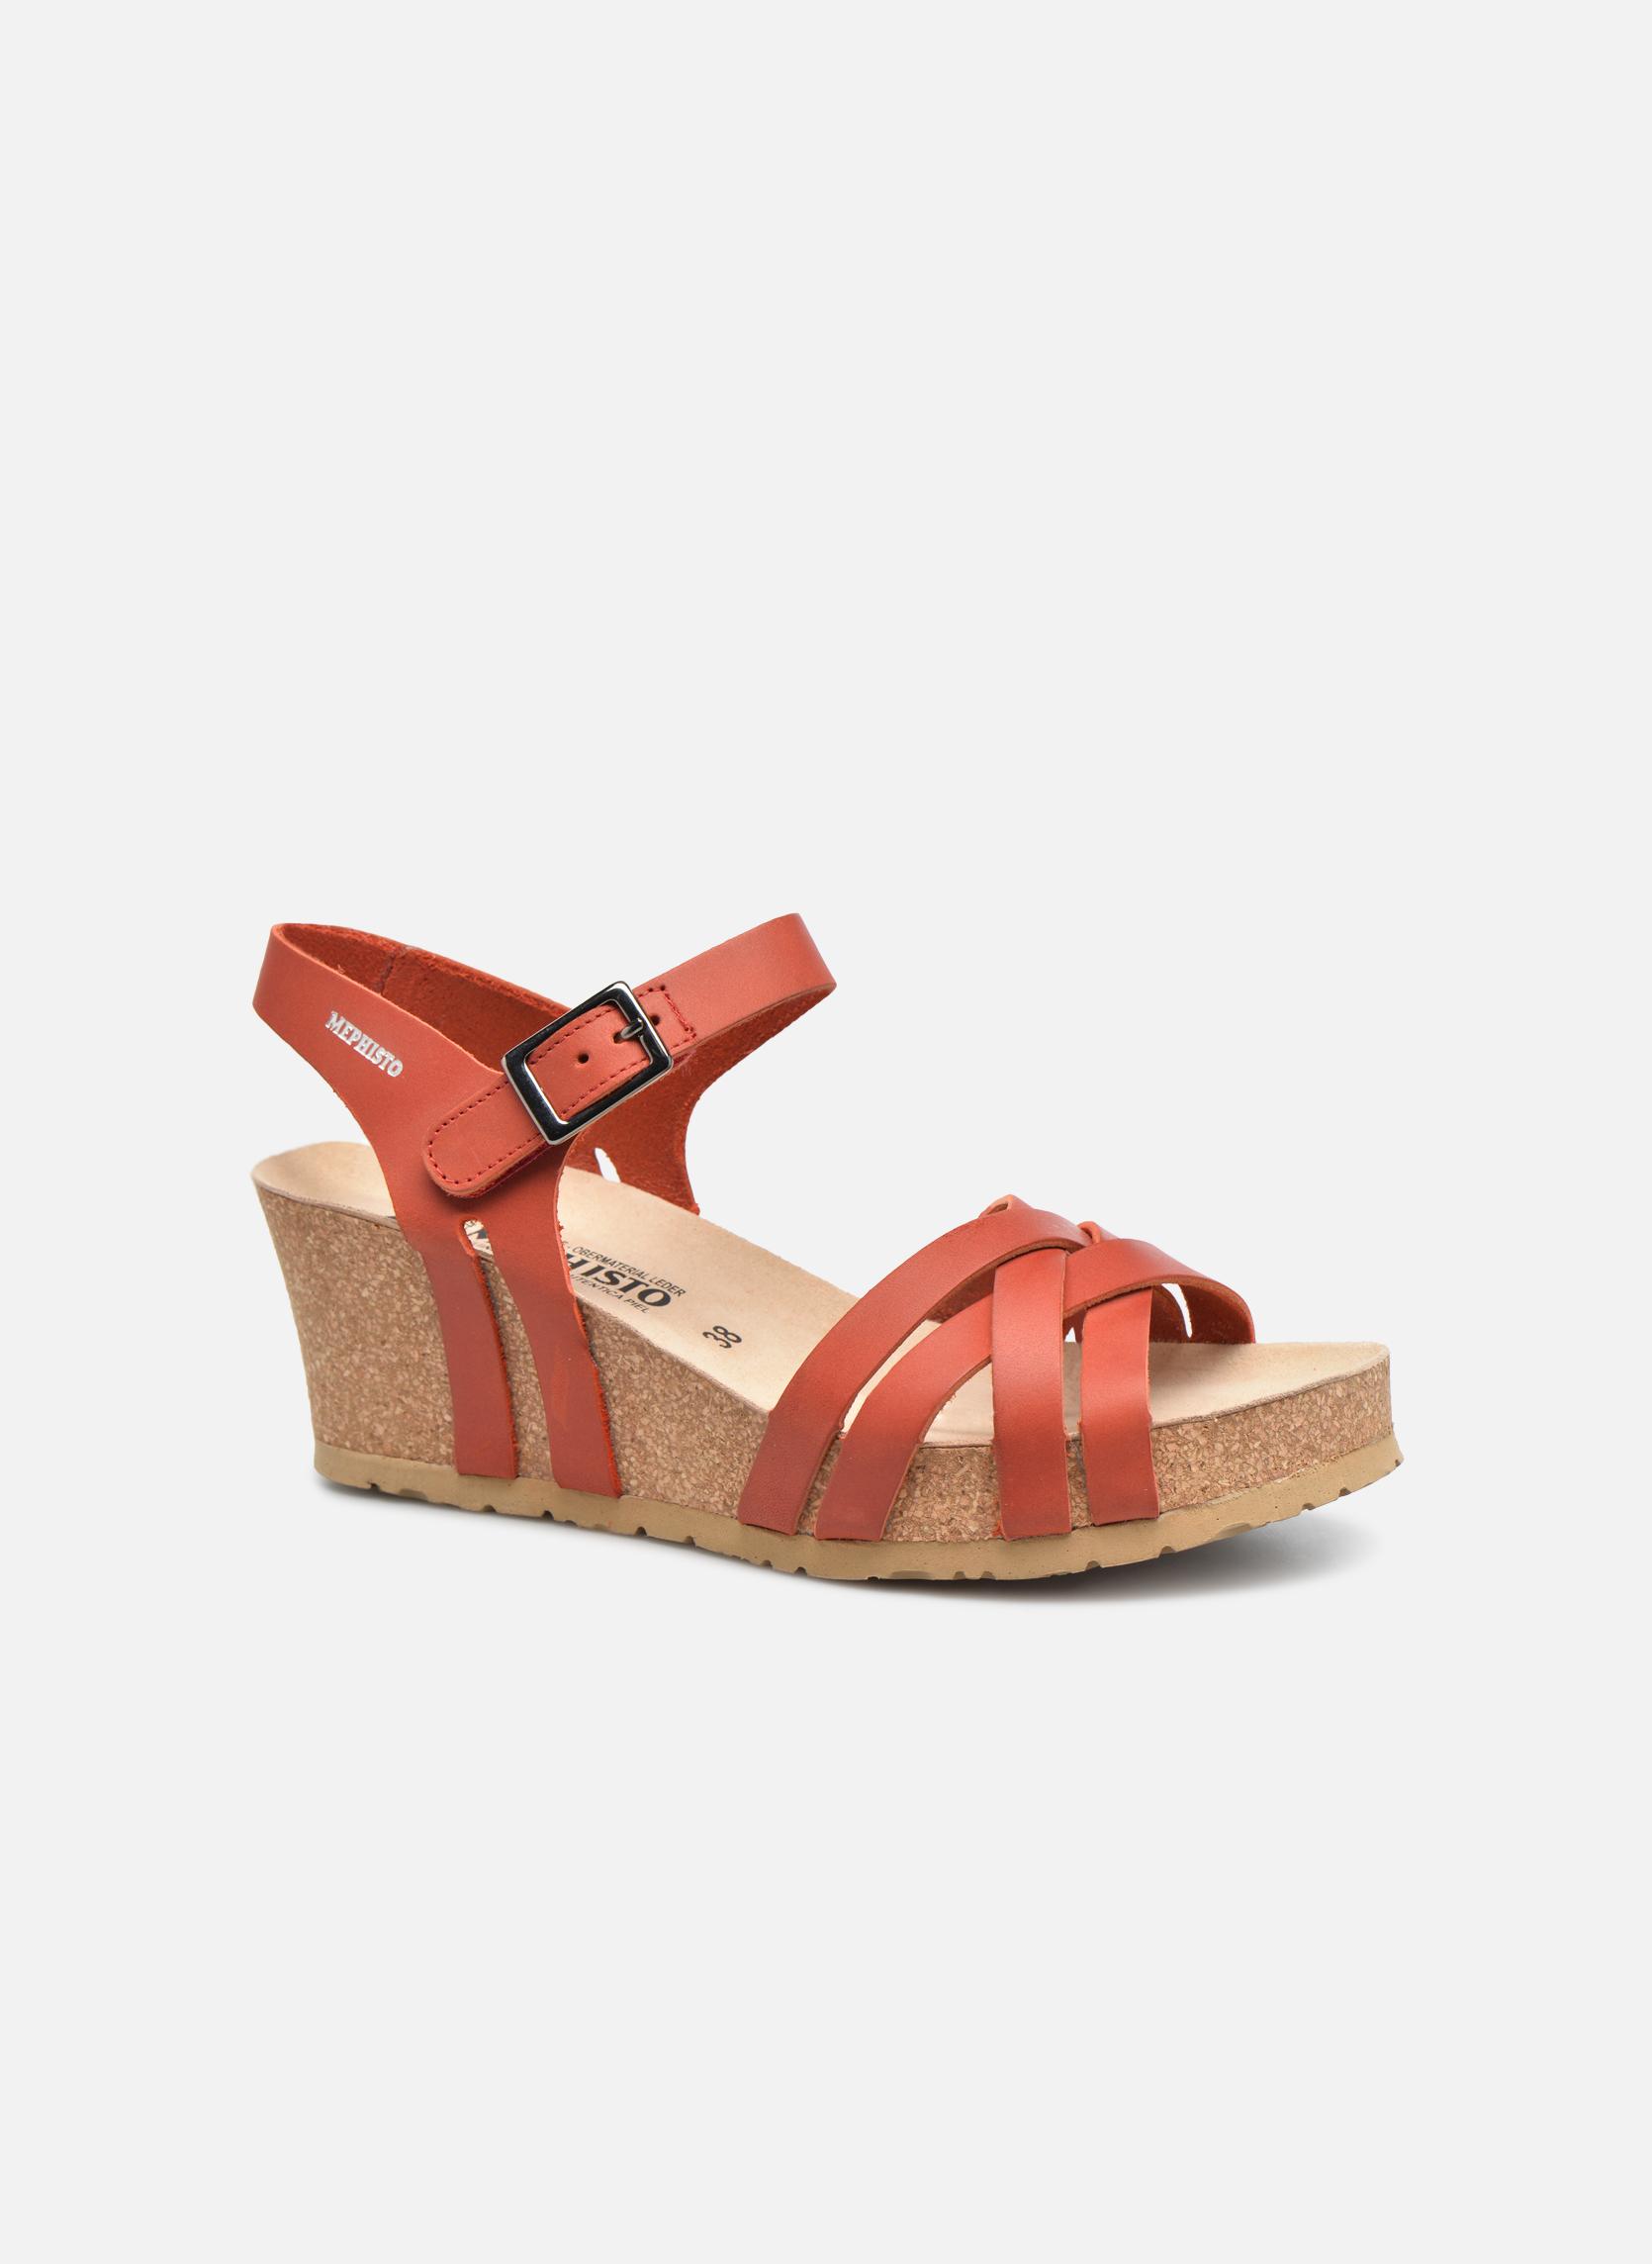 Sandals Women Lanny